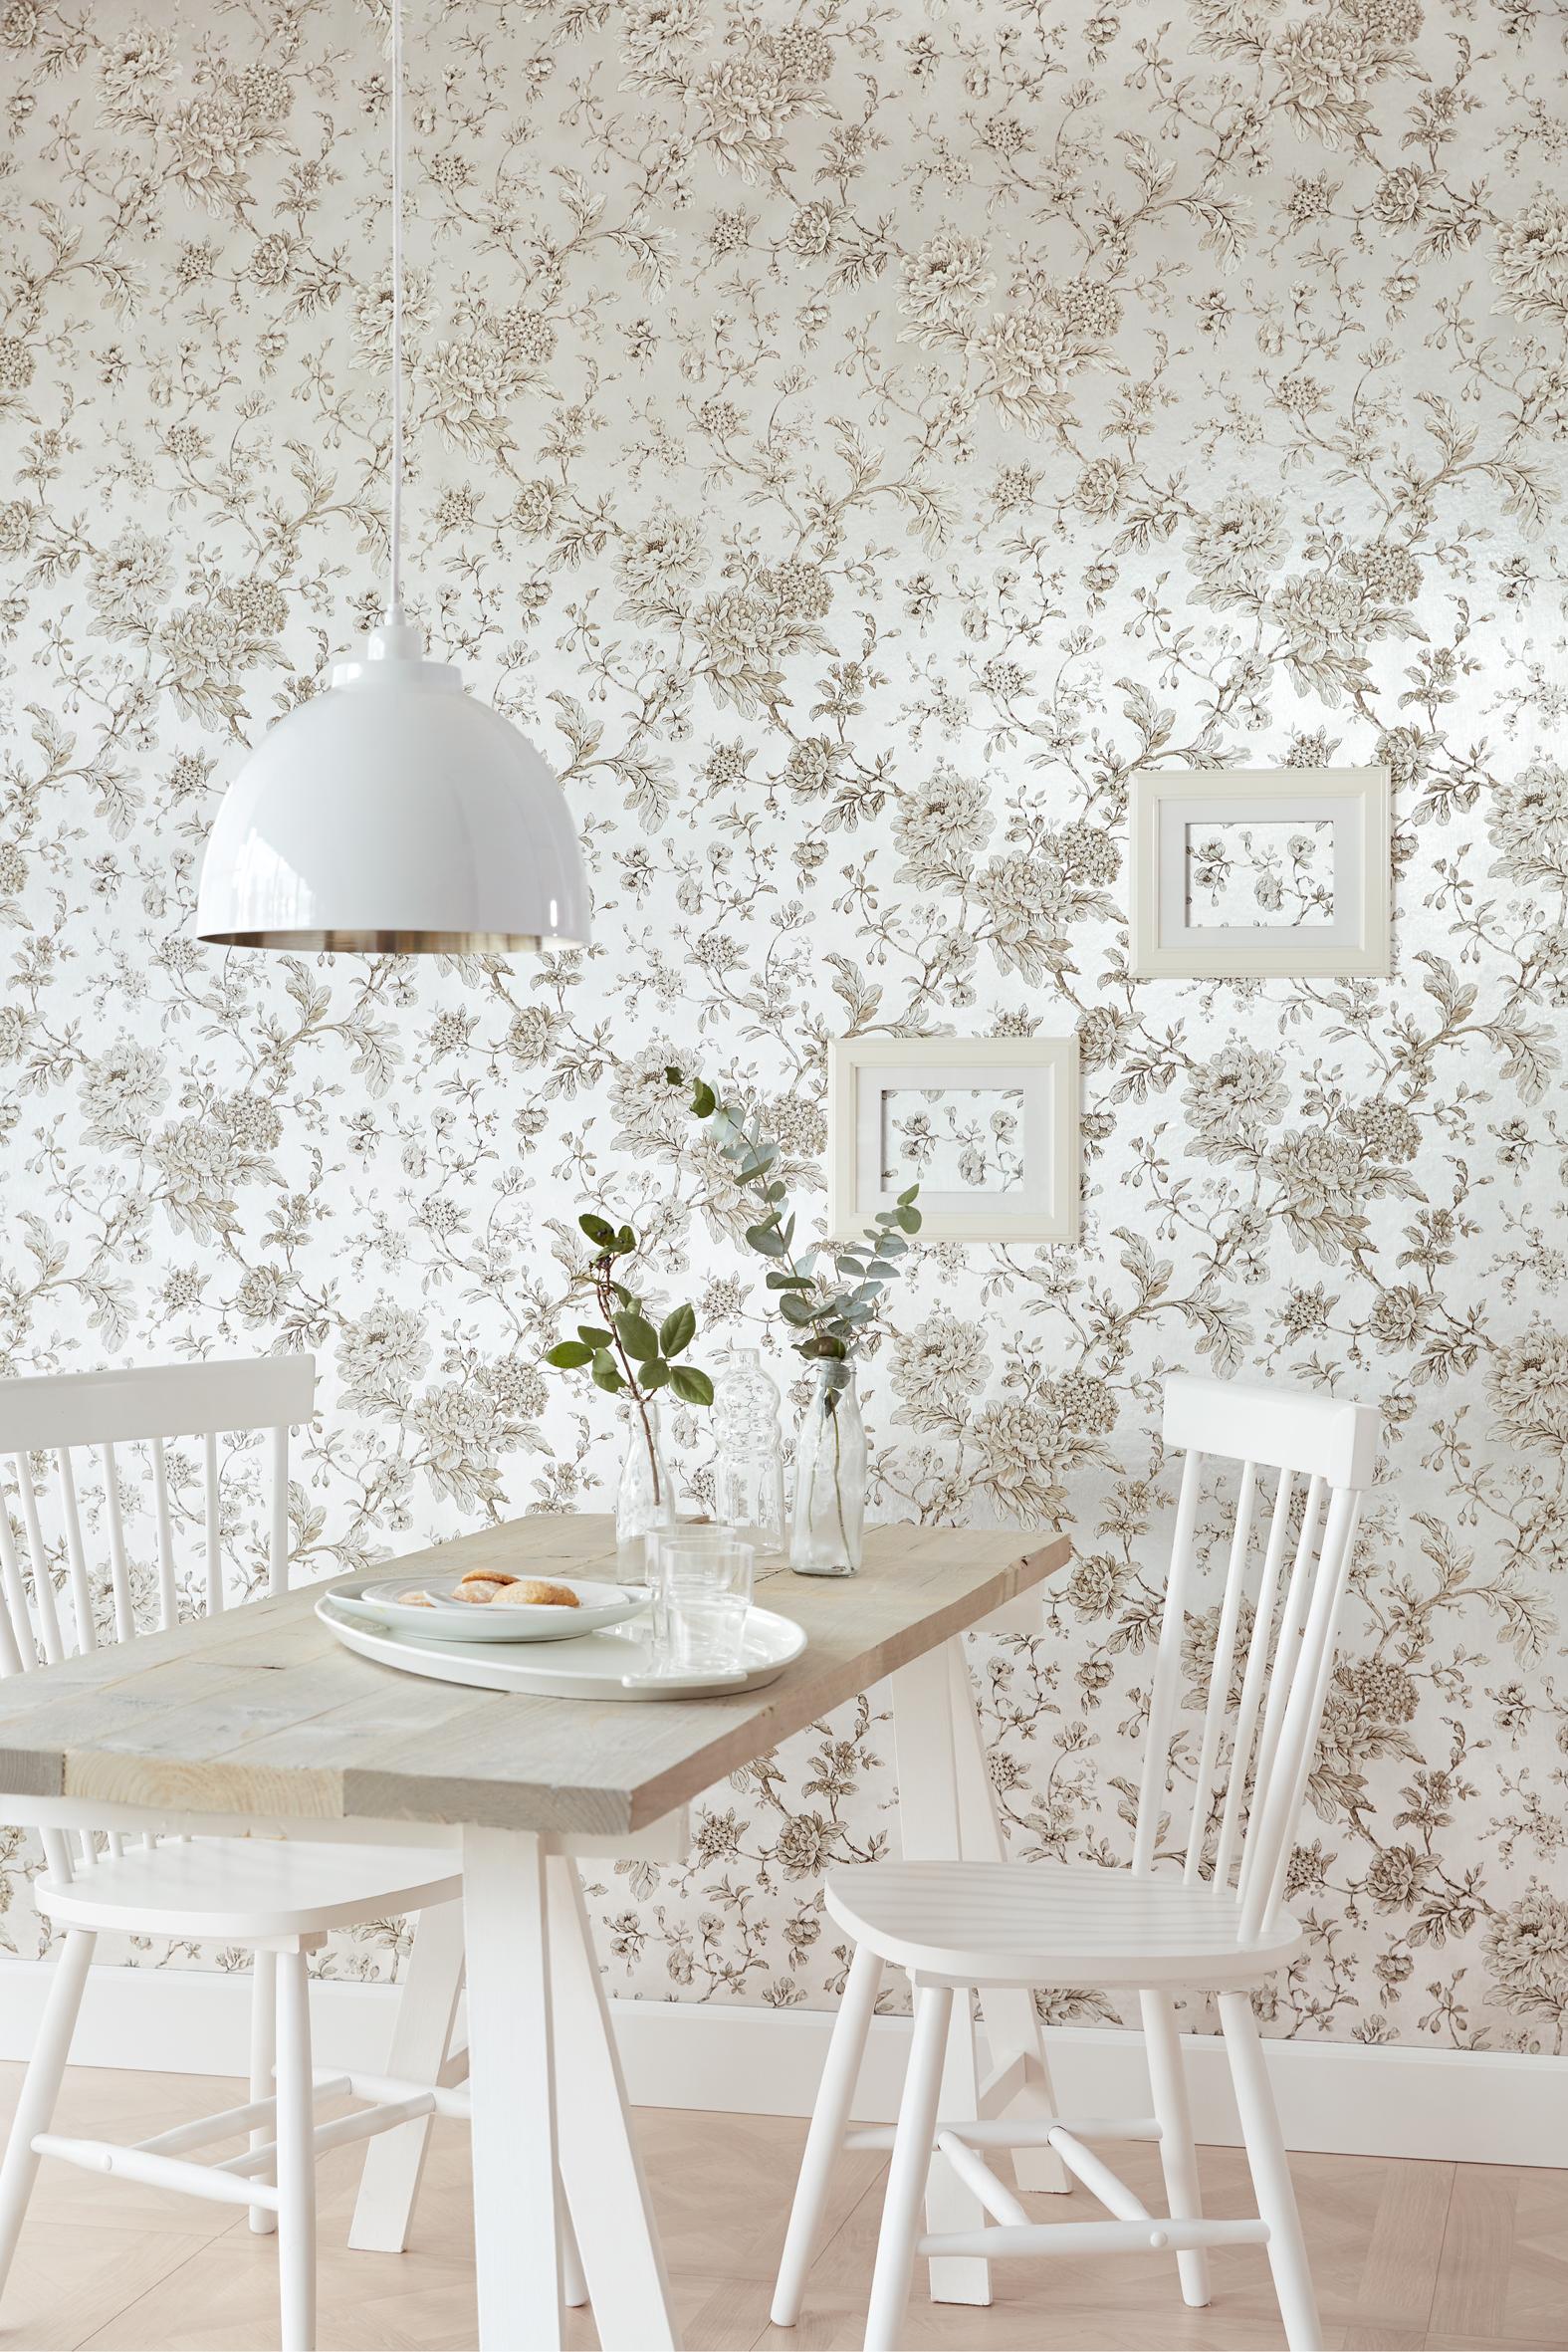 Papeles pintados con brillos plata villalba interiorismo for Imagenes de papel pintado